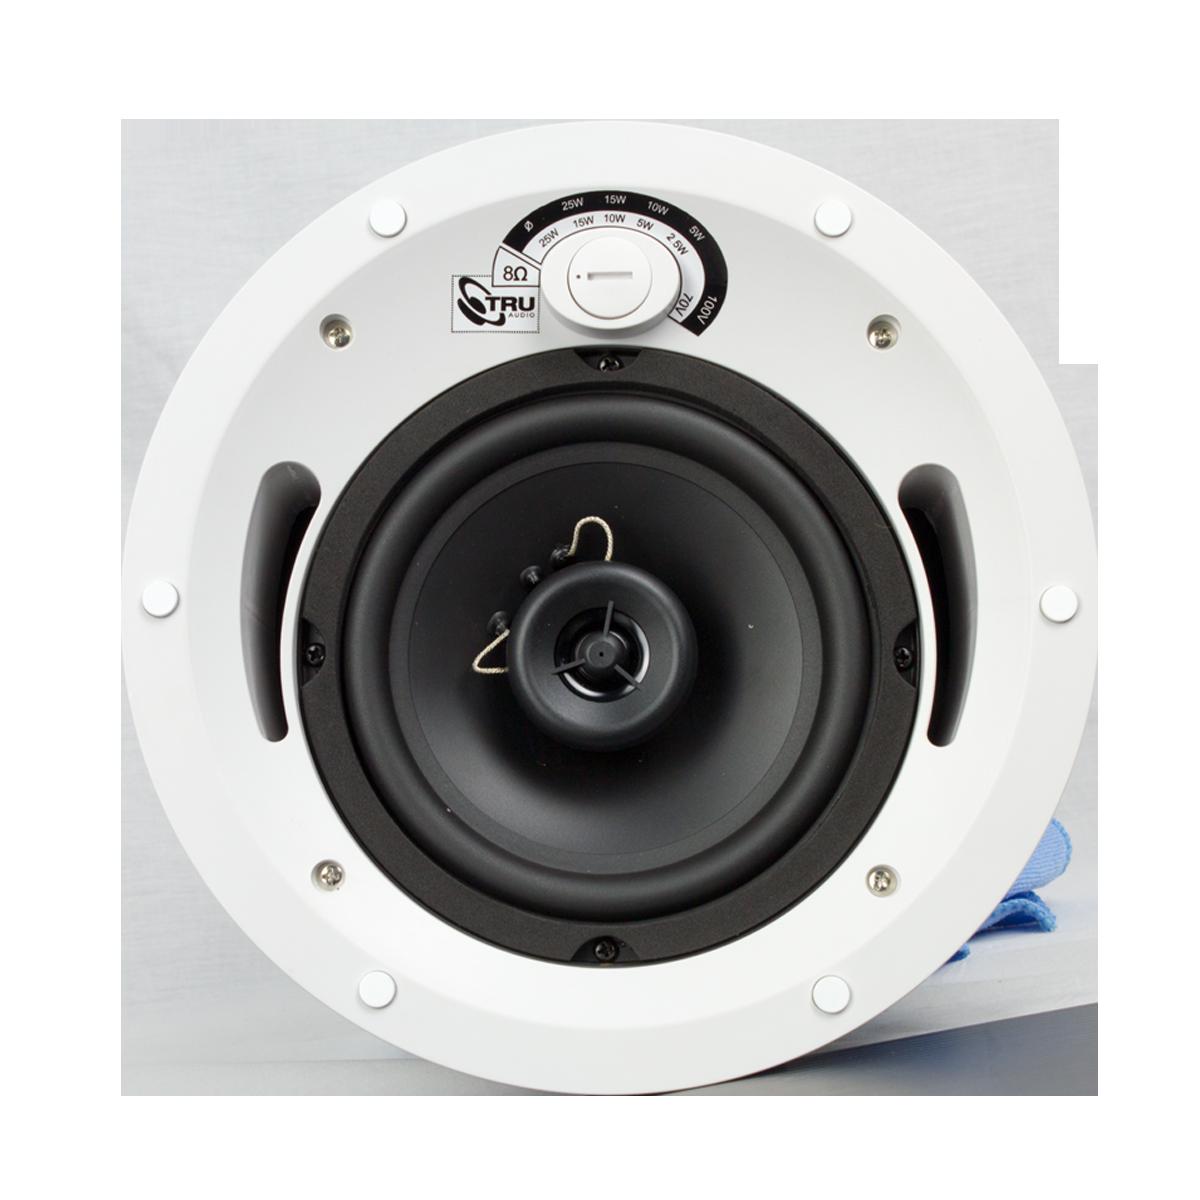 Klipsch Subwoofer Wiring Diagram Diagrams 70v Audio Volume 15 Inch Promedia 2 1 Repair